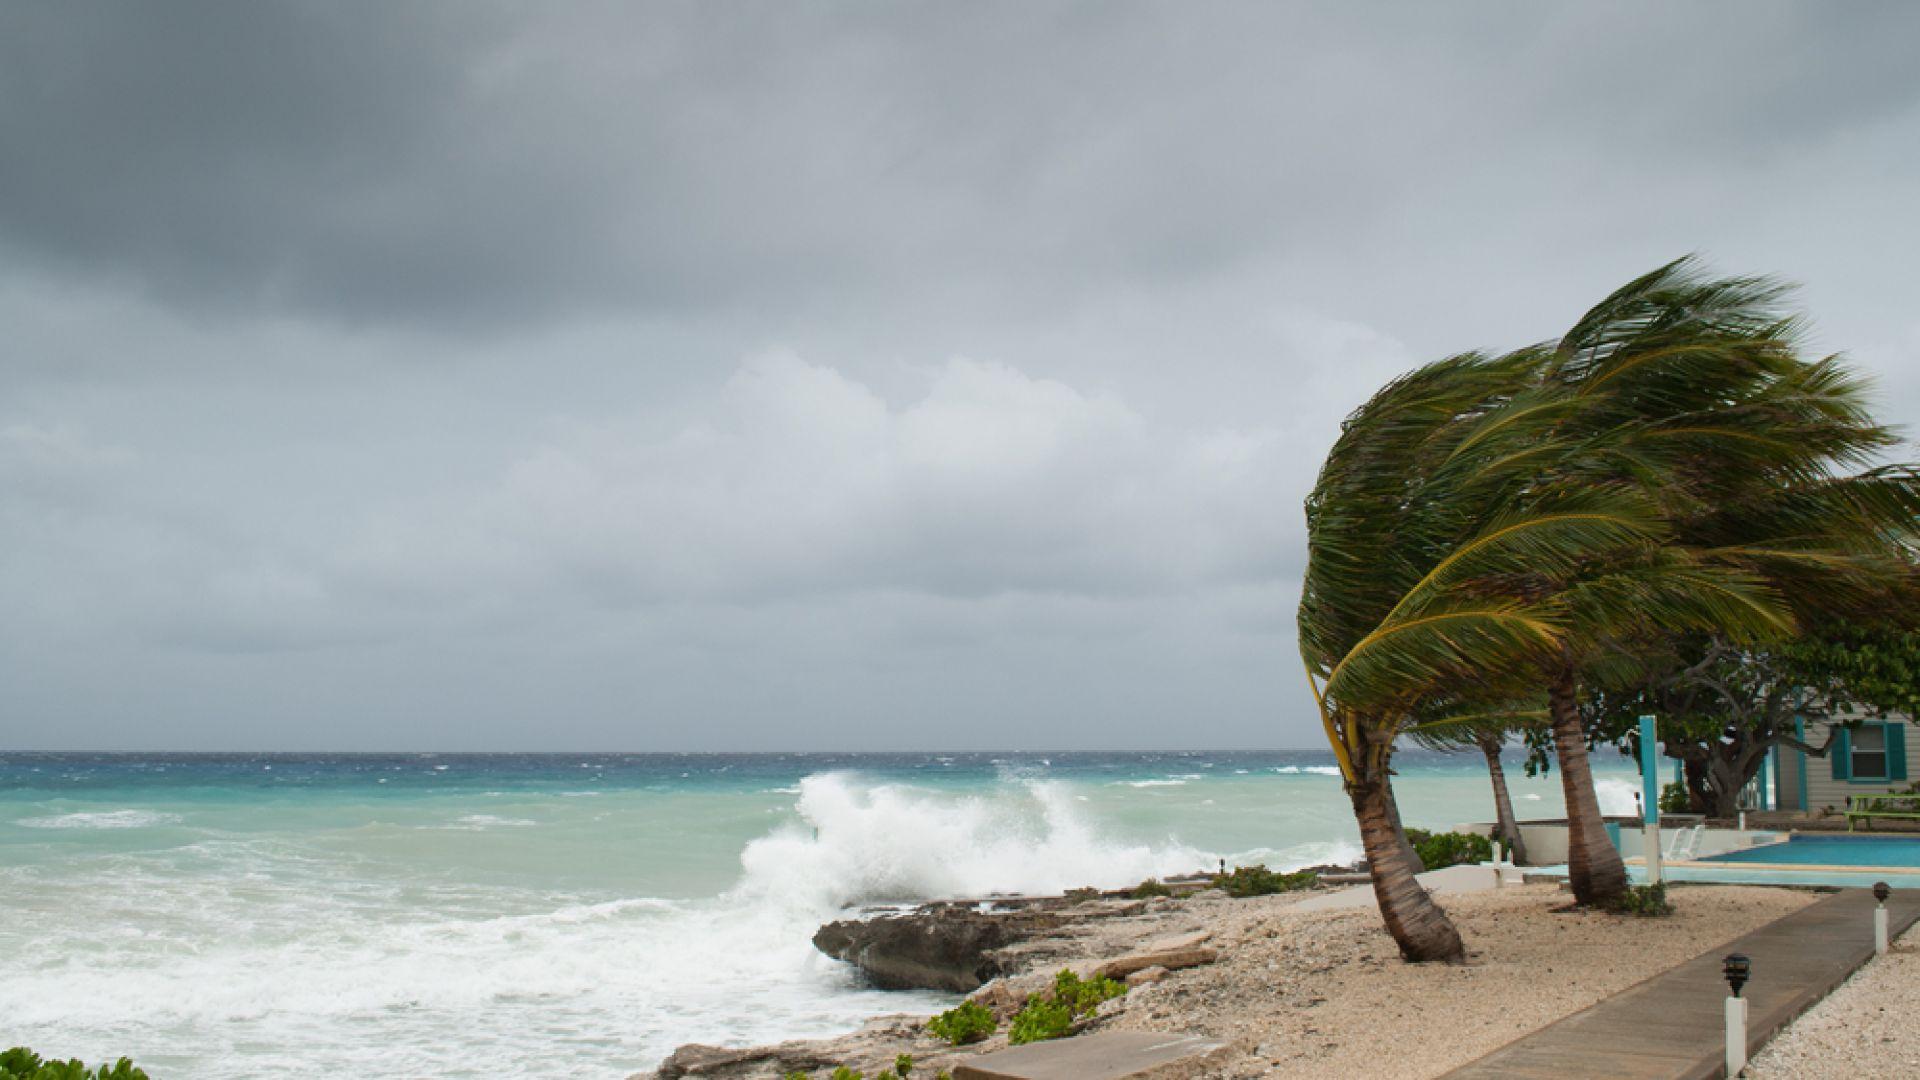 Може ли ураган да достигне и удари Балканите?